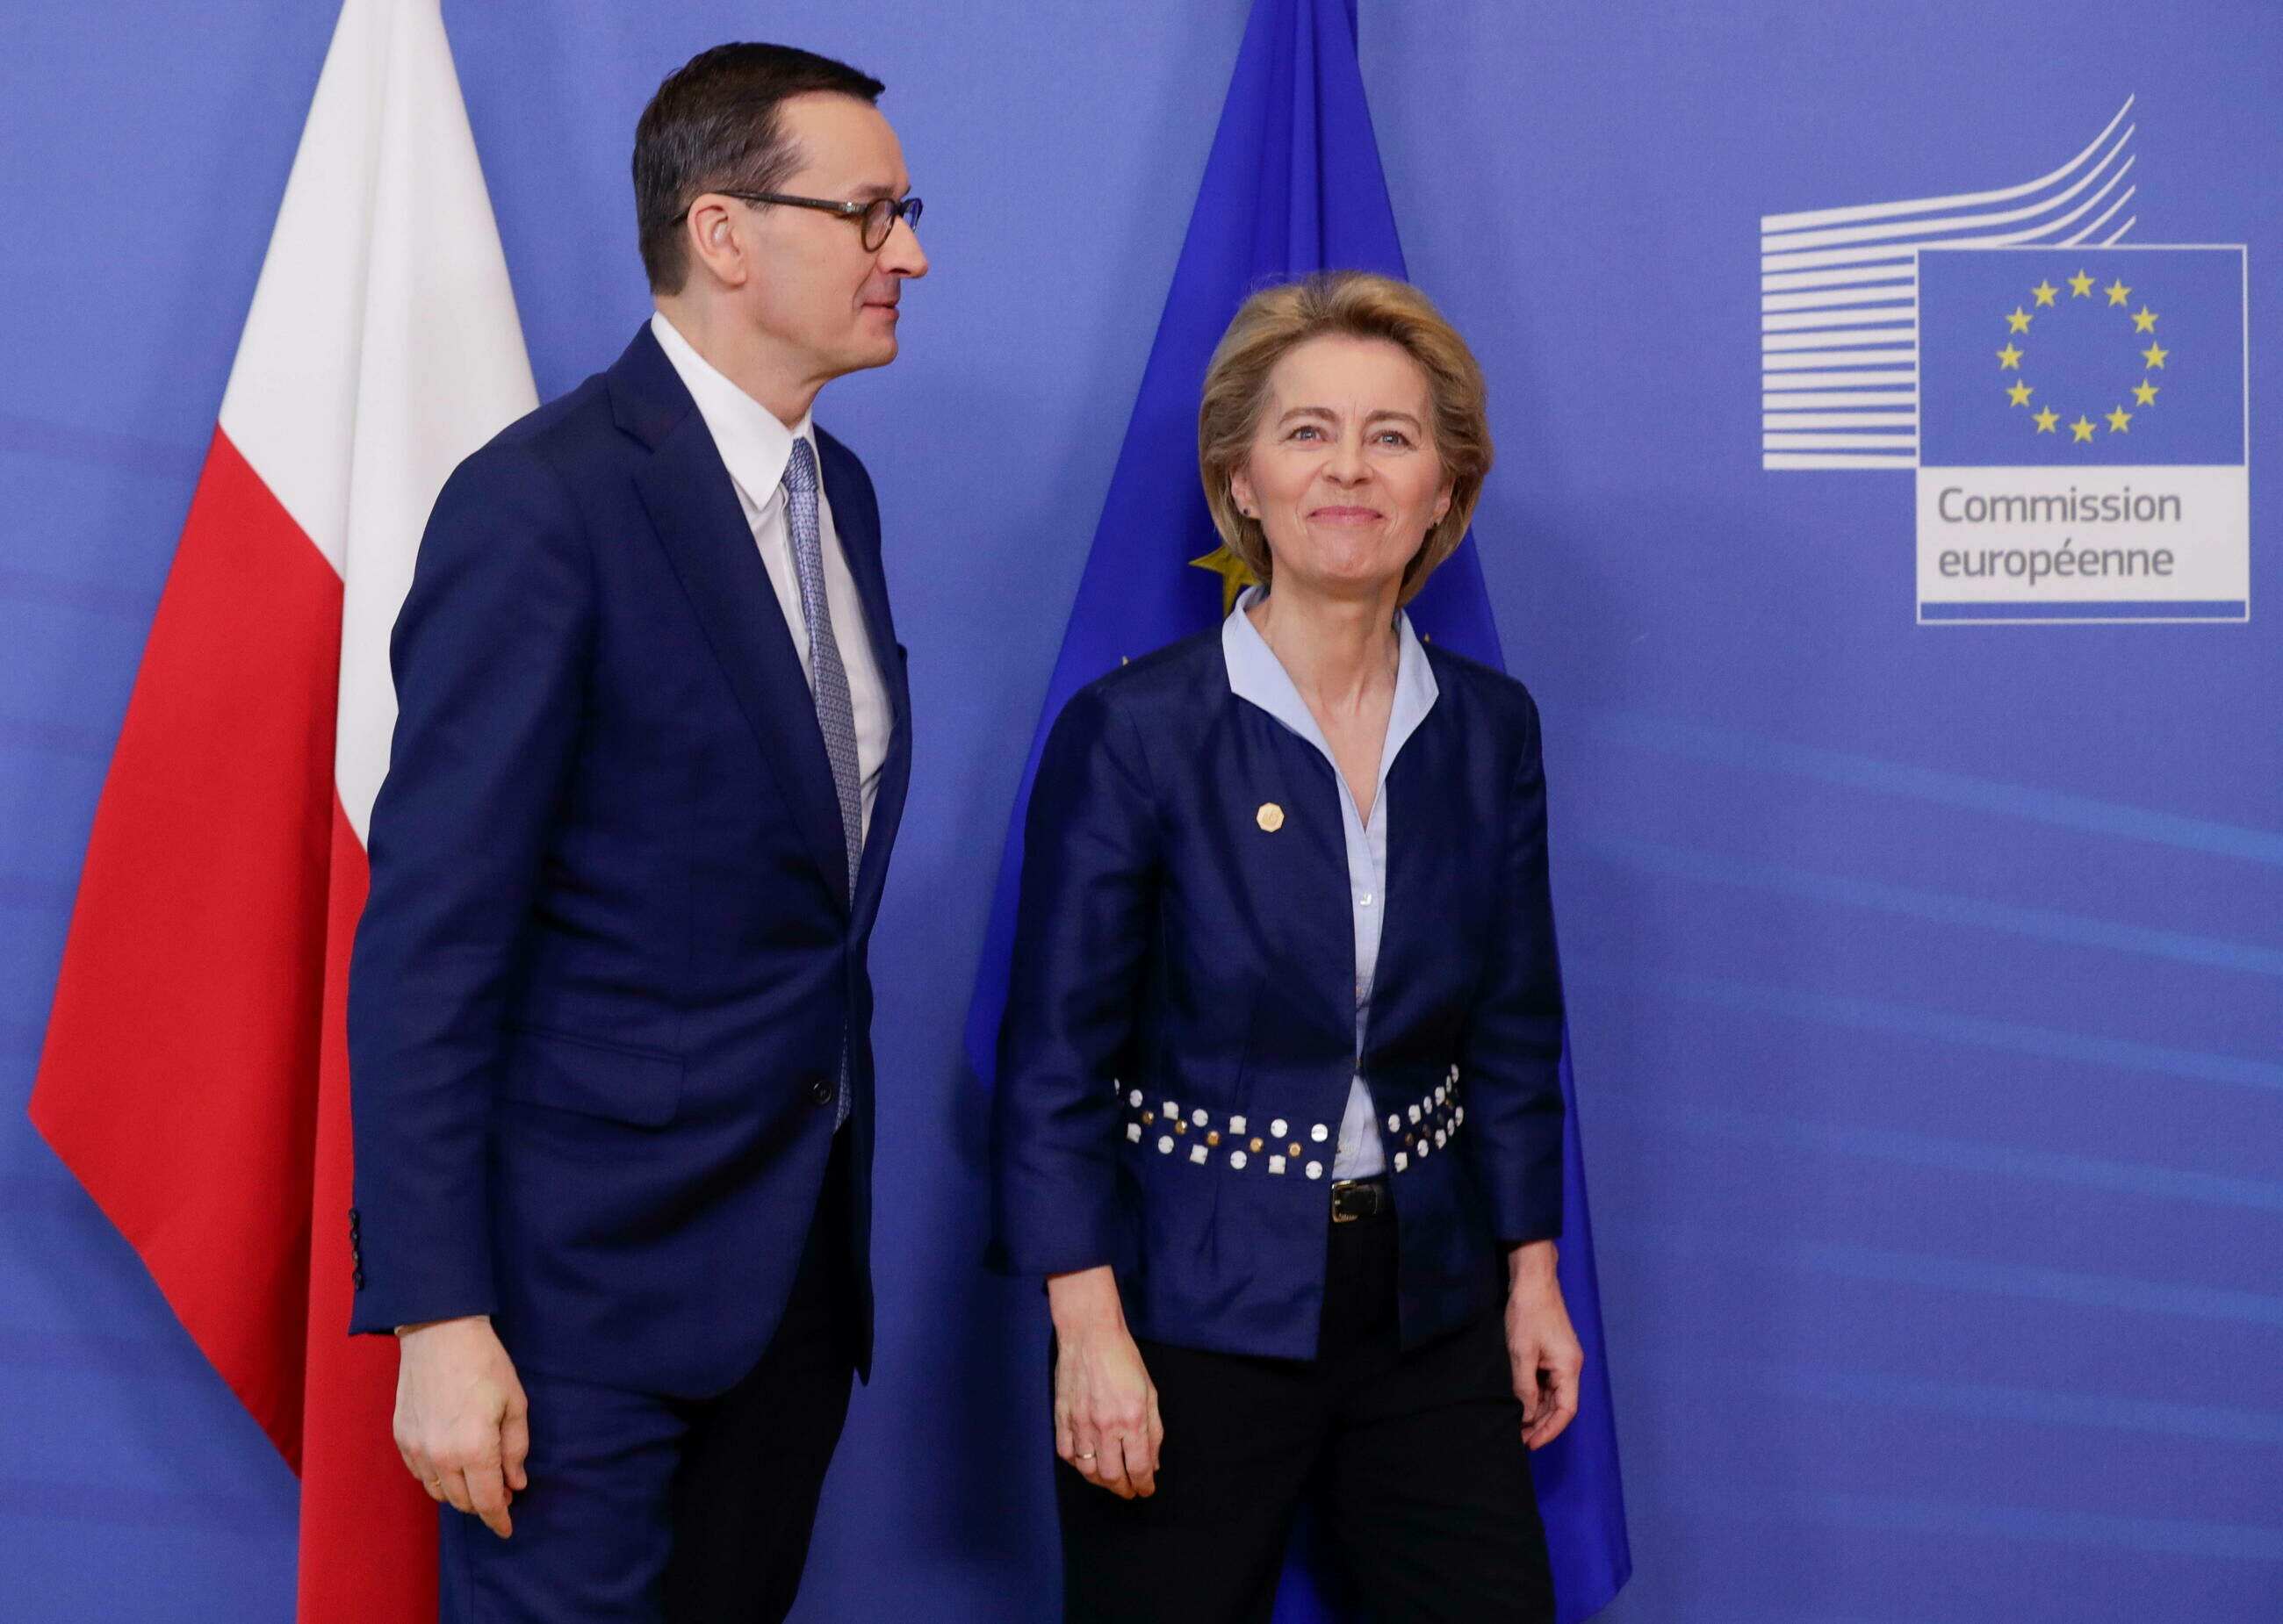 Mateusz Morawiecki i Ursula von der Leyen w Brukseli